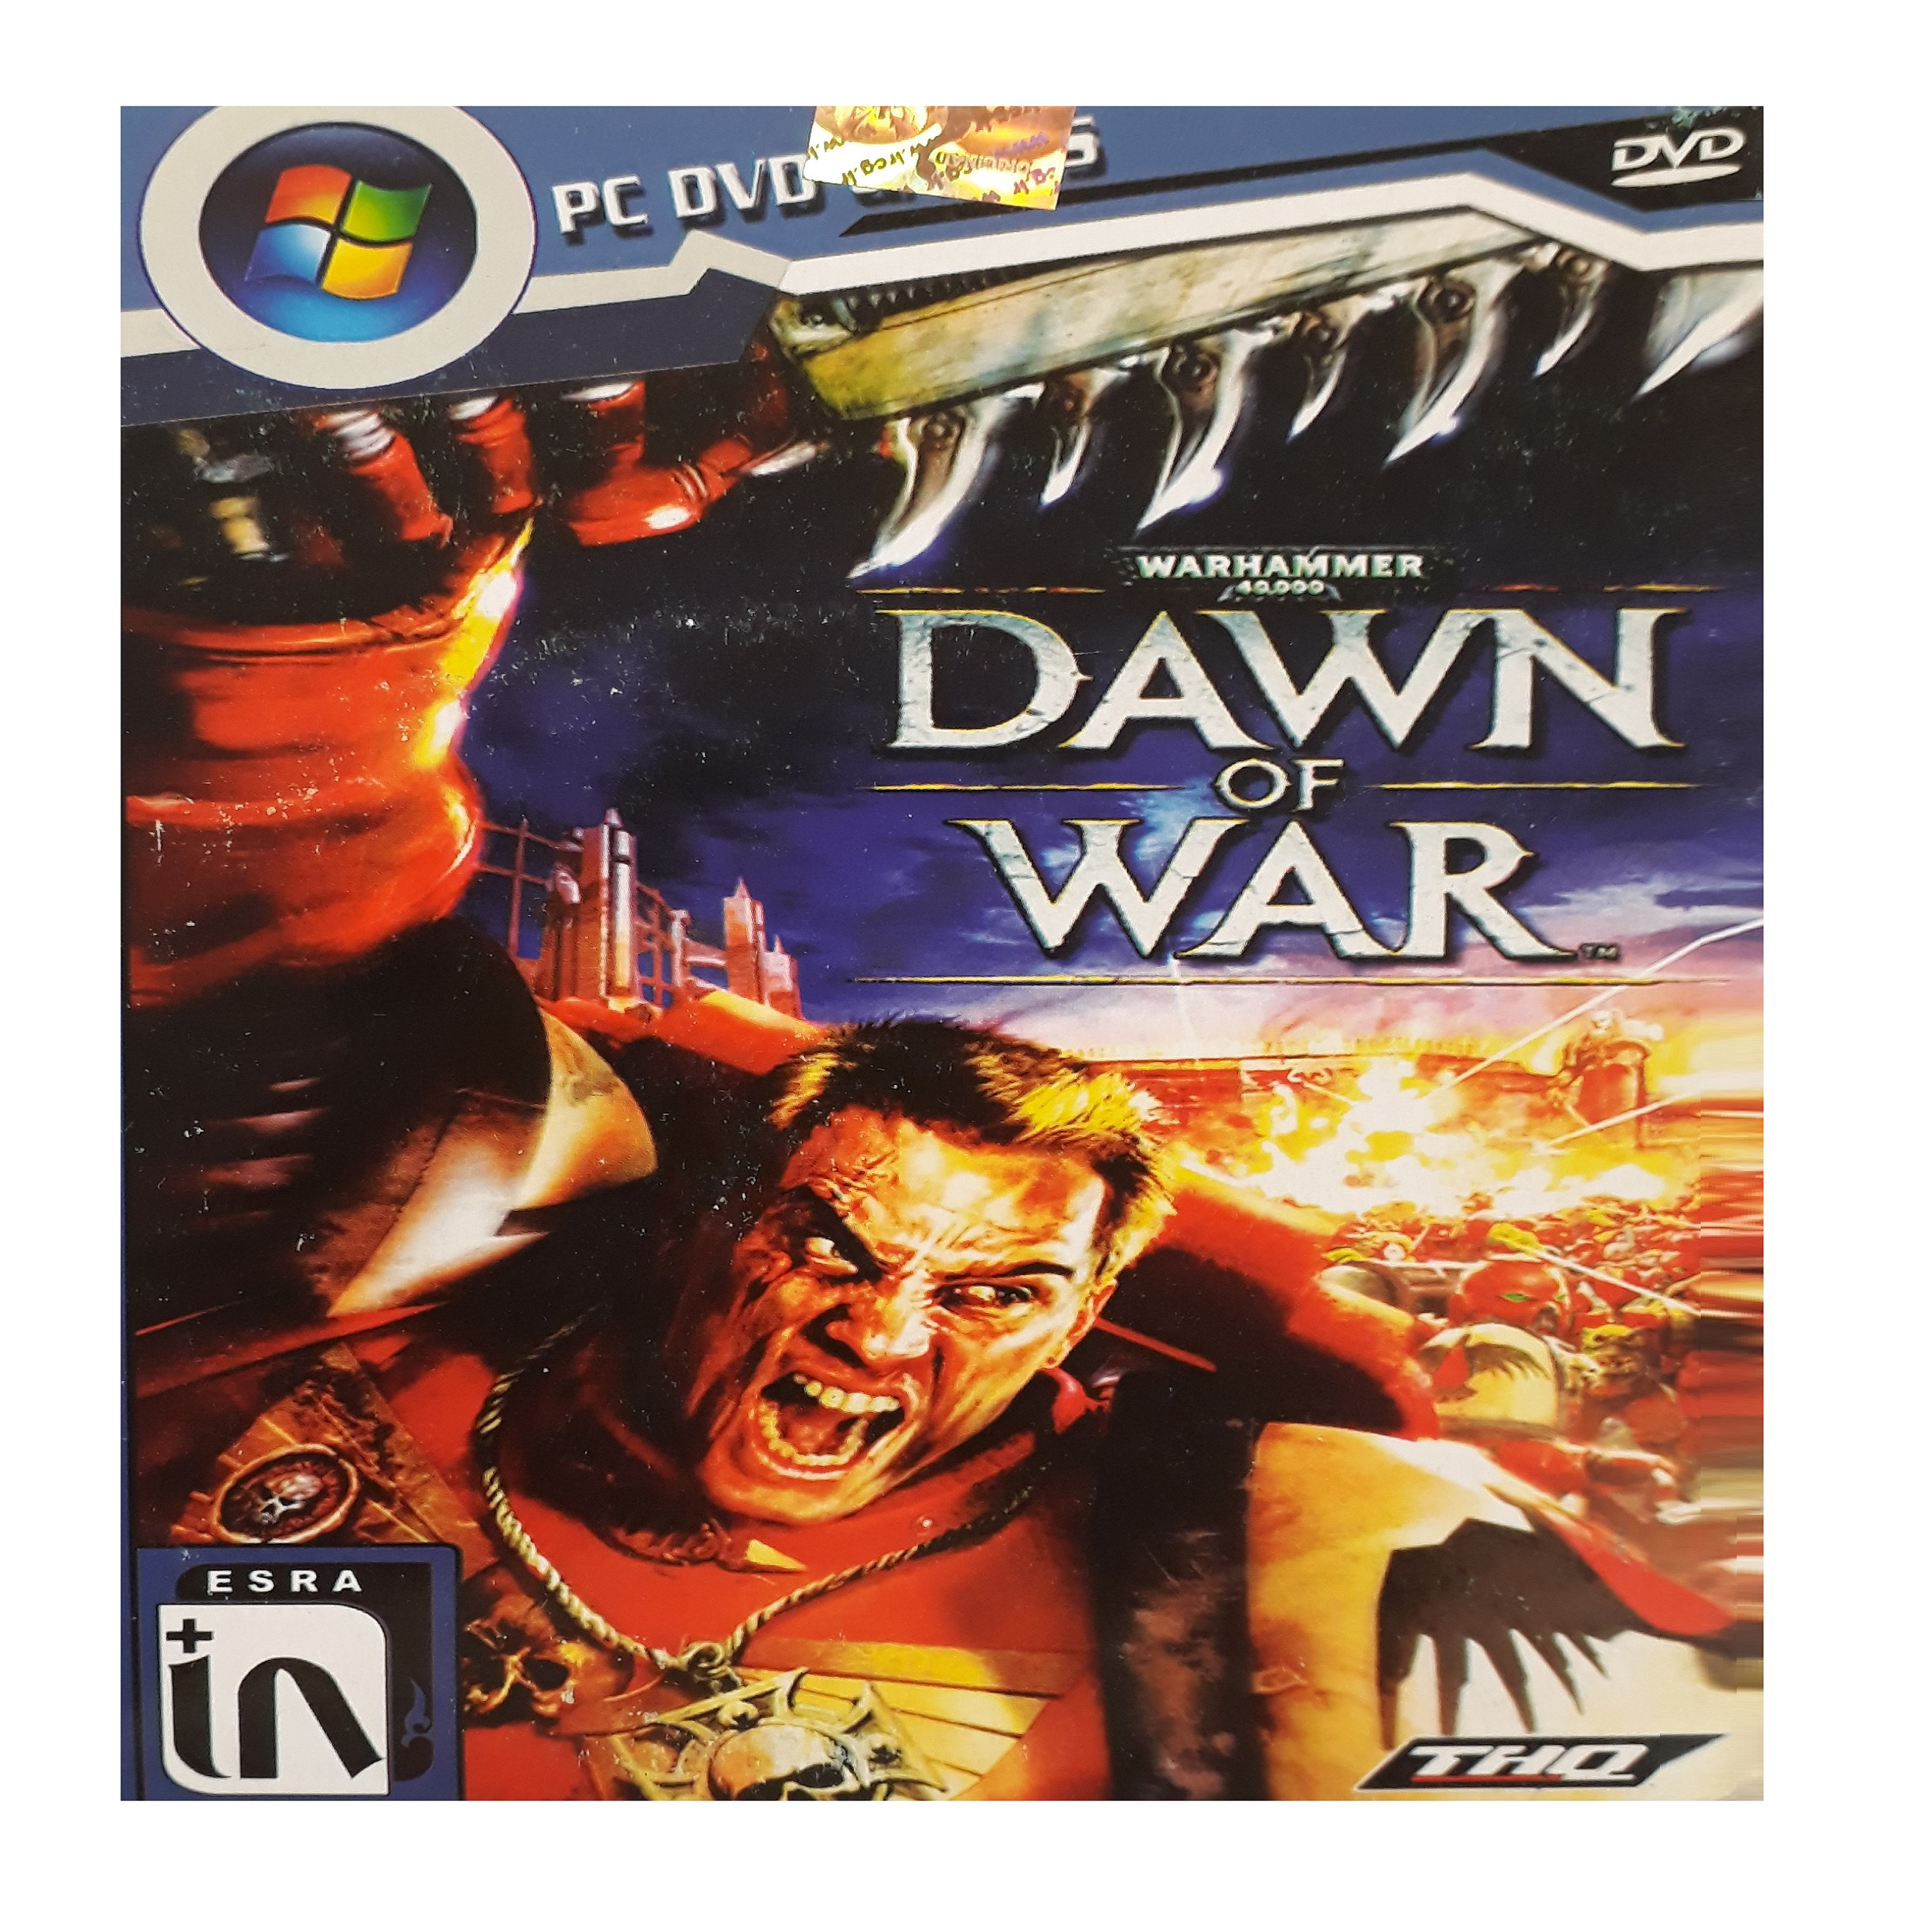 بازی dawn of war مخصوص pc